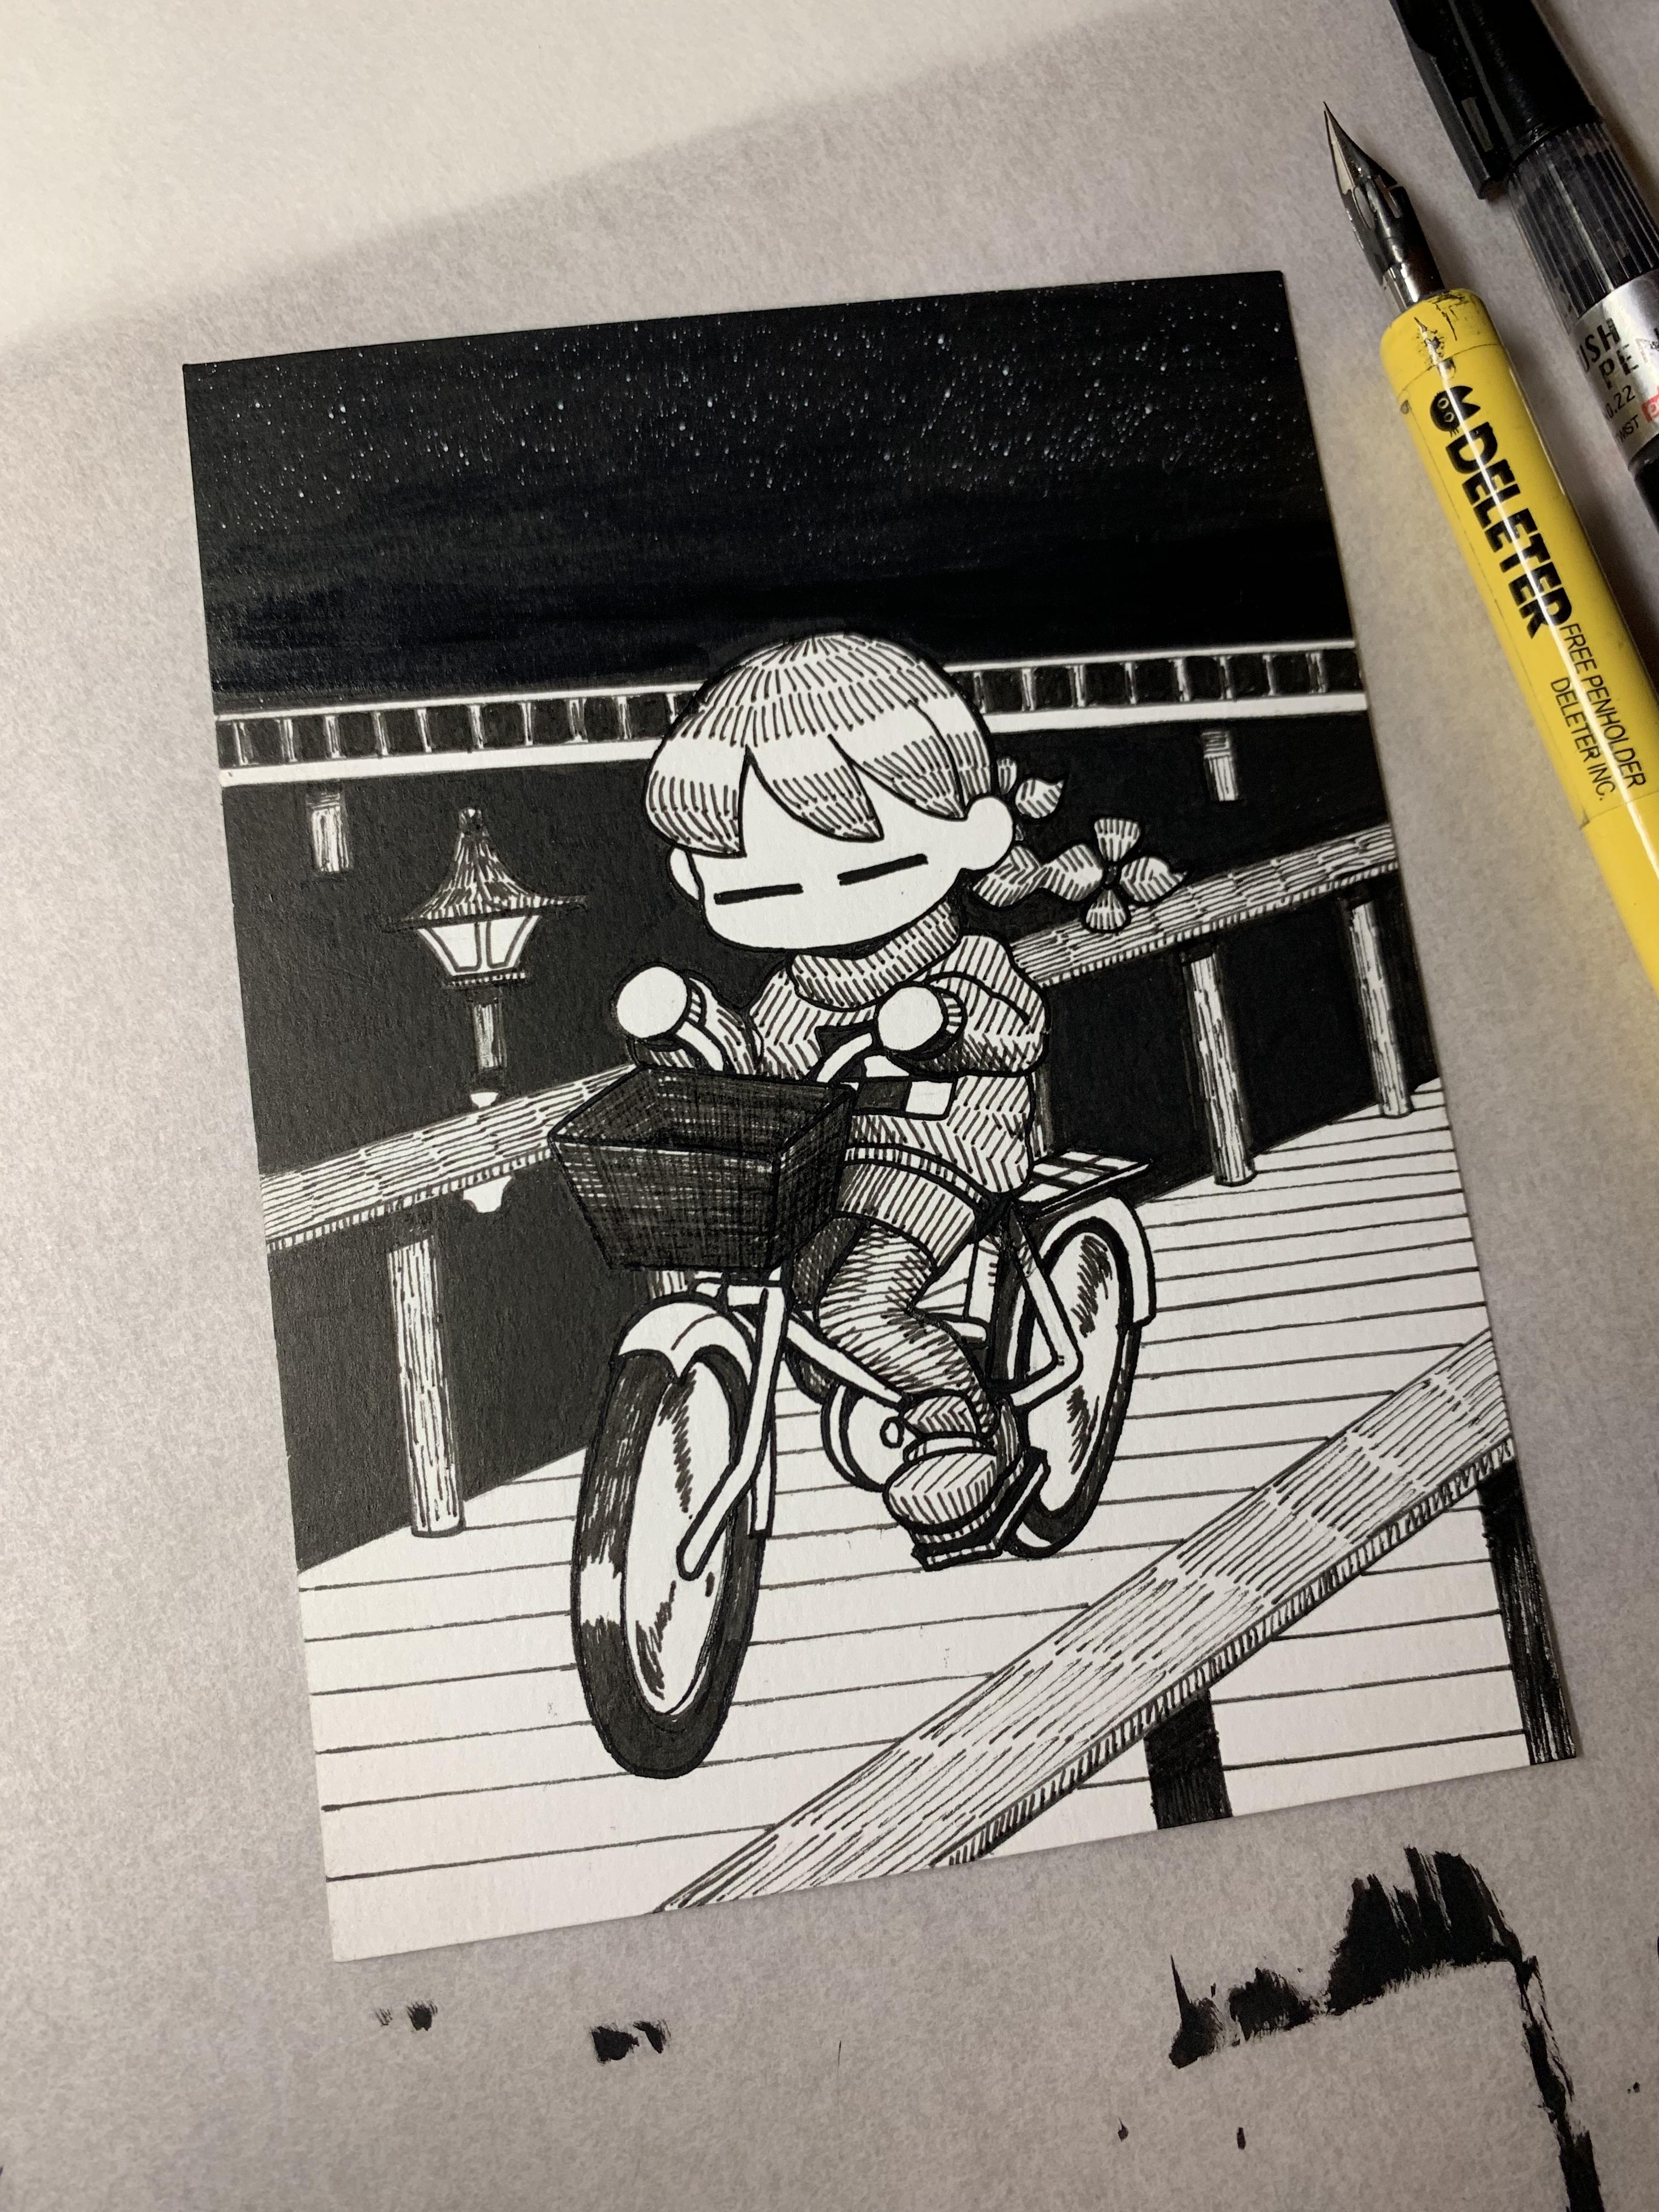 Inktober 2019 - No. 2 - Bicycle